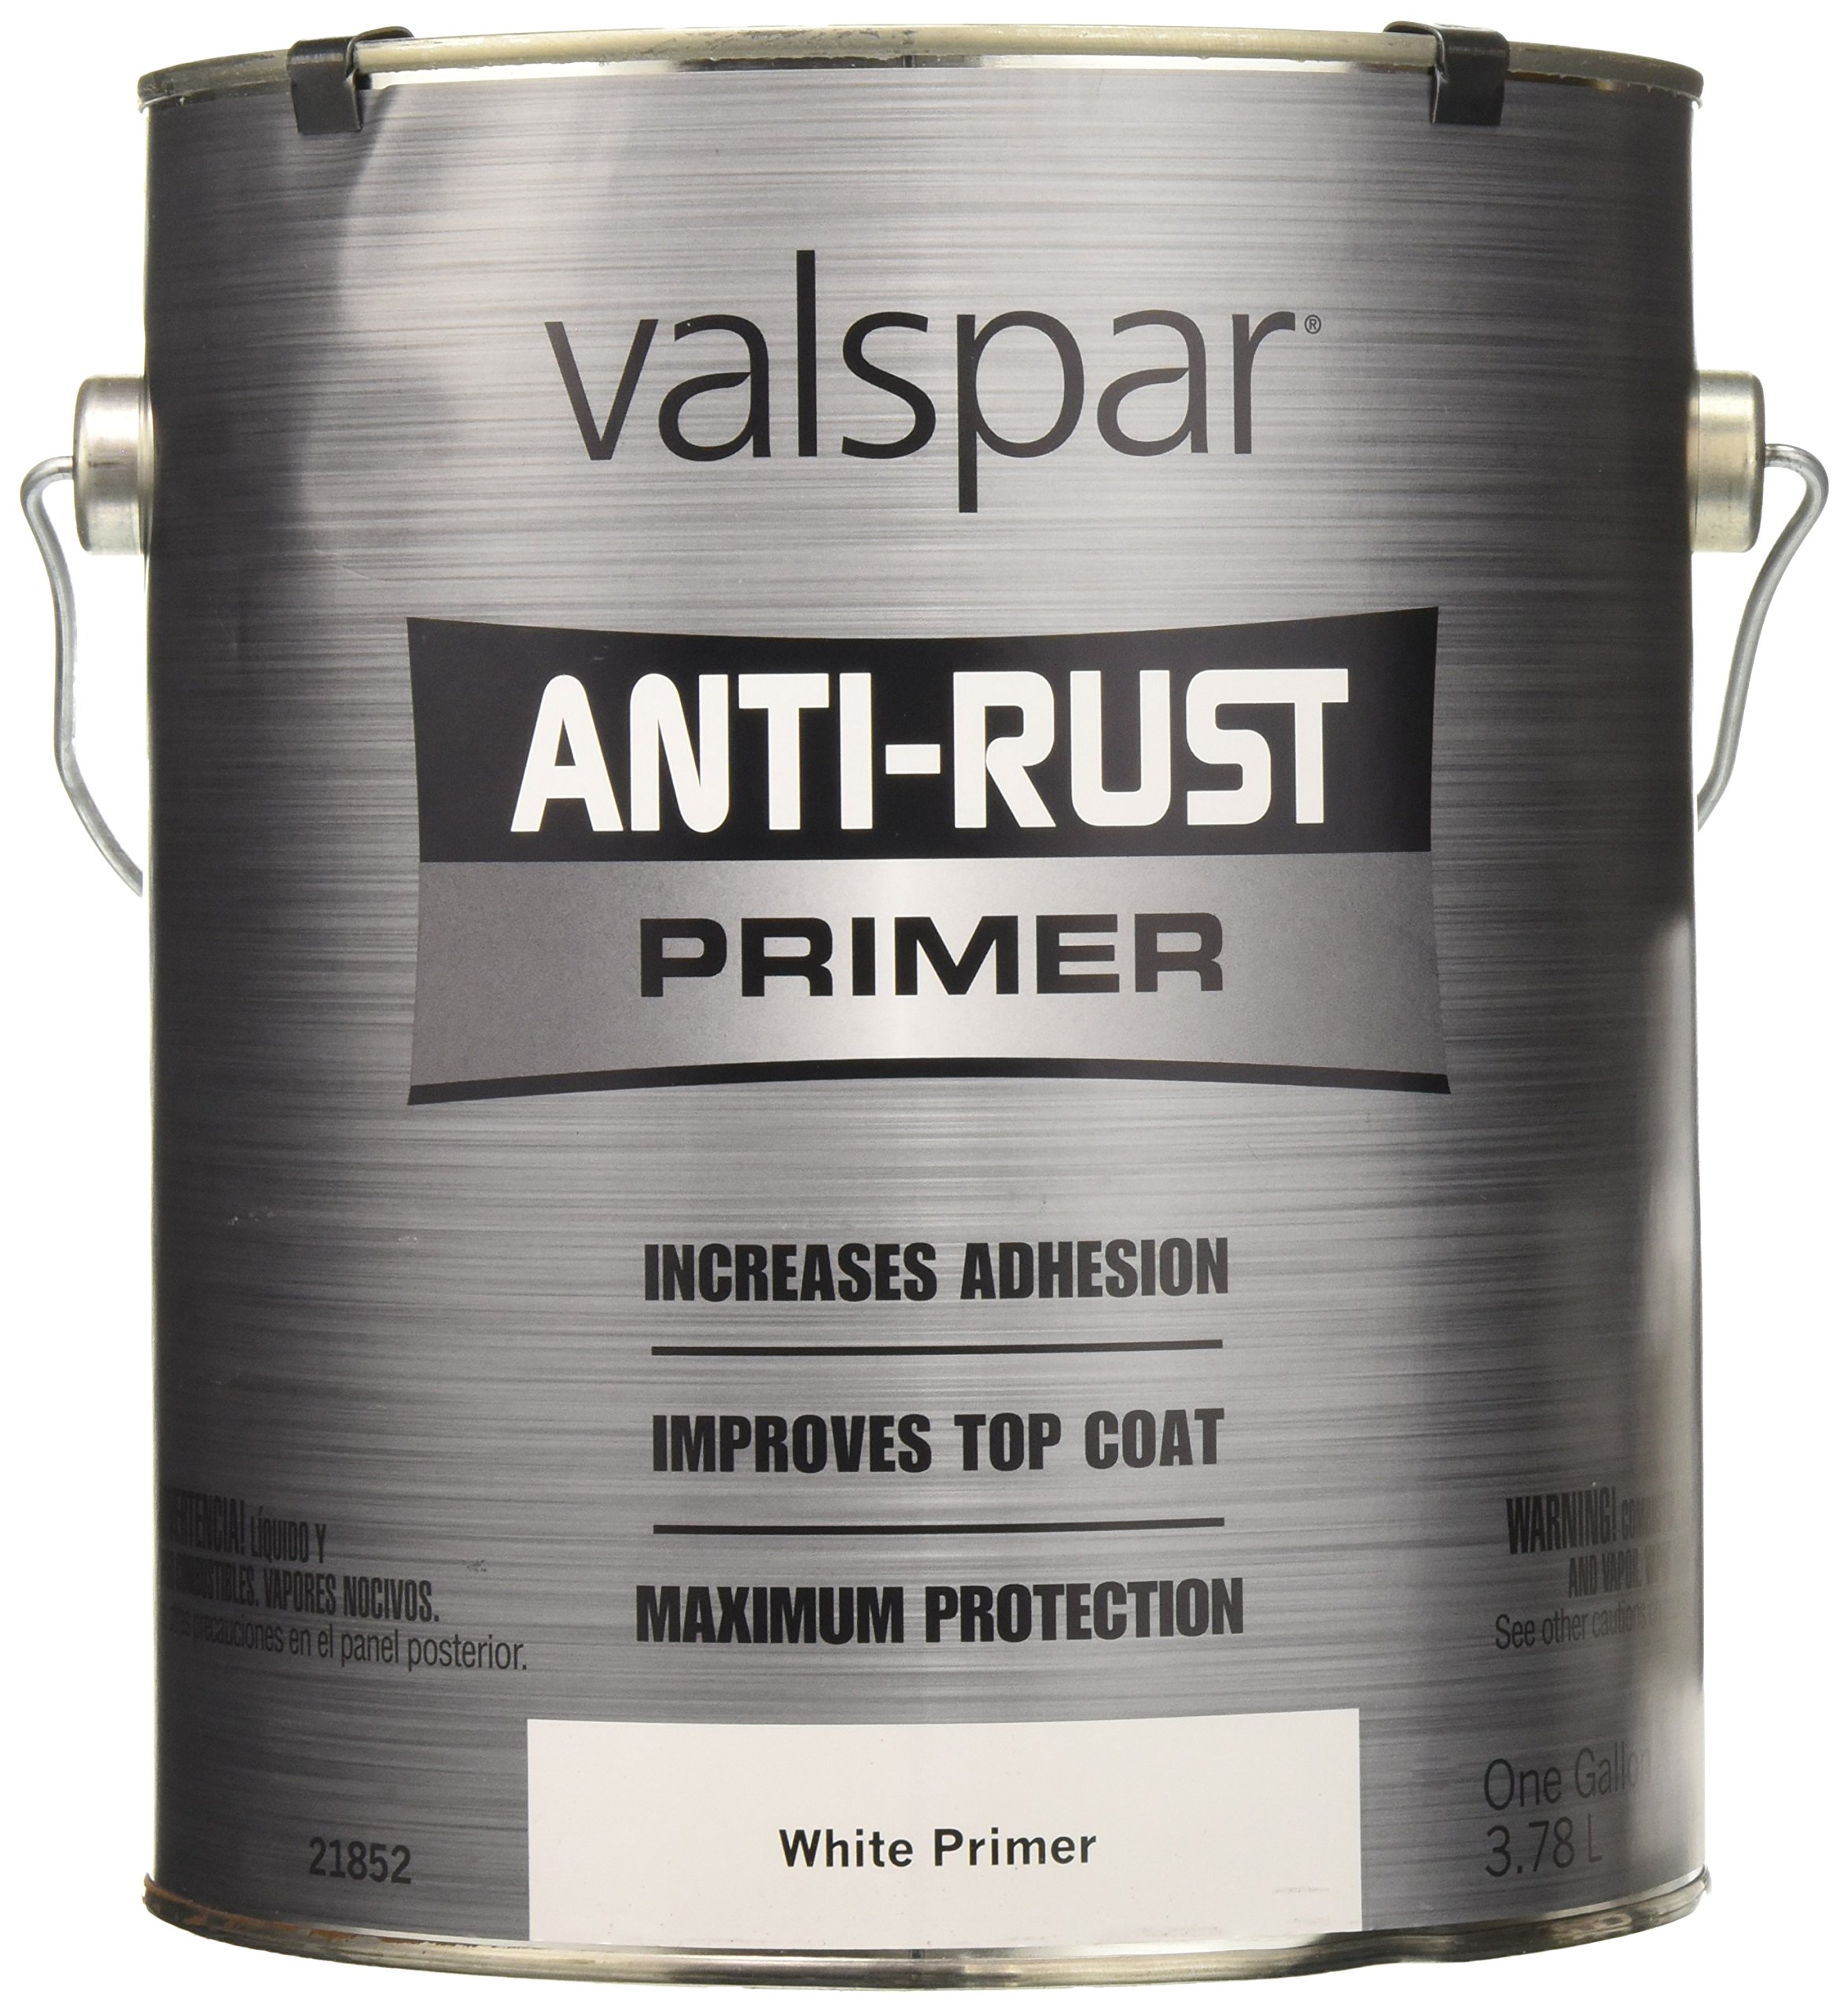 Valspar 21852G White Metal Primer Enamel - 1 Gallon by Valspar